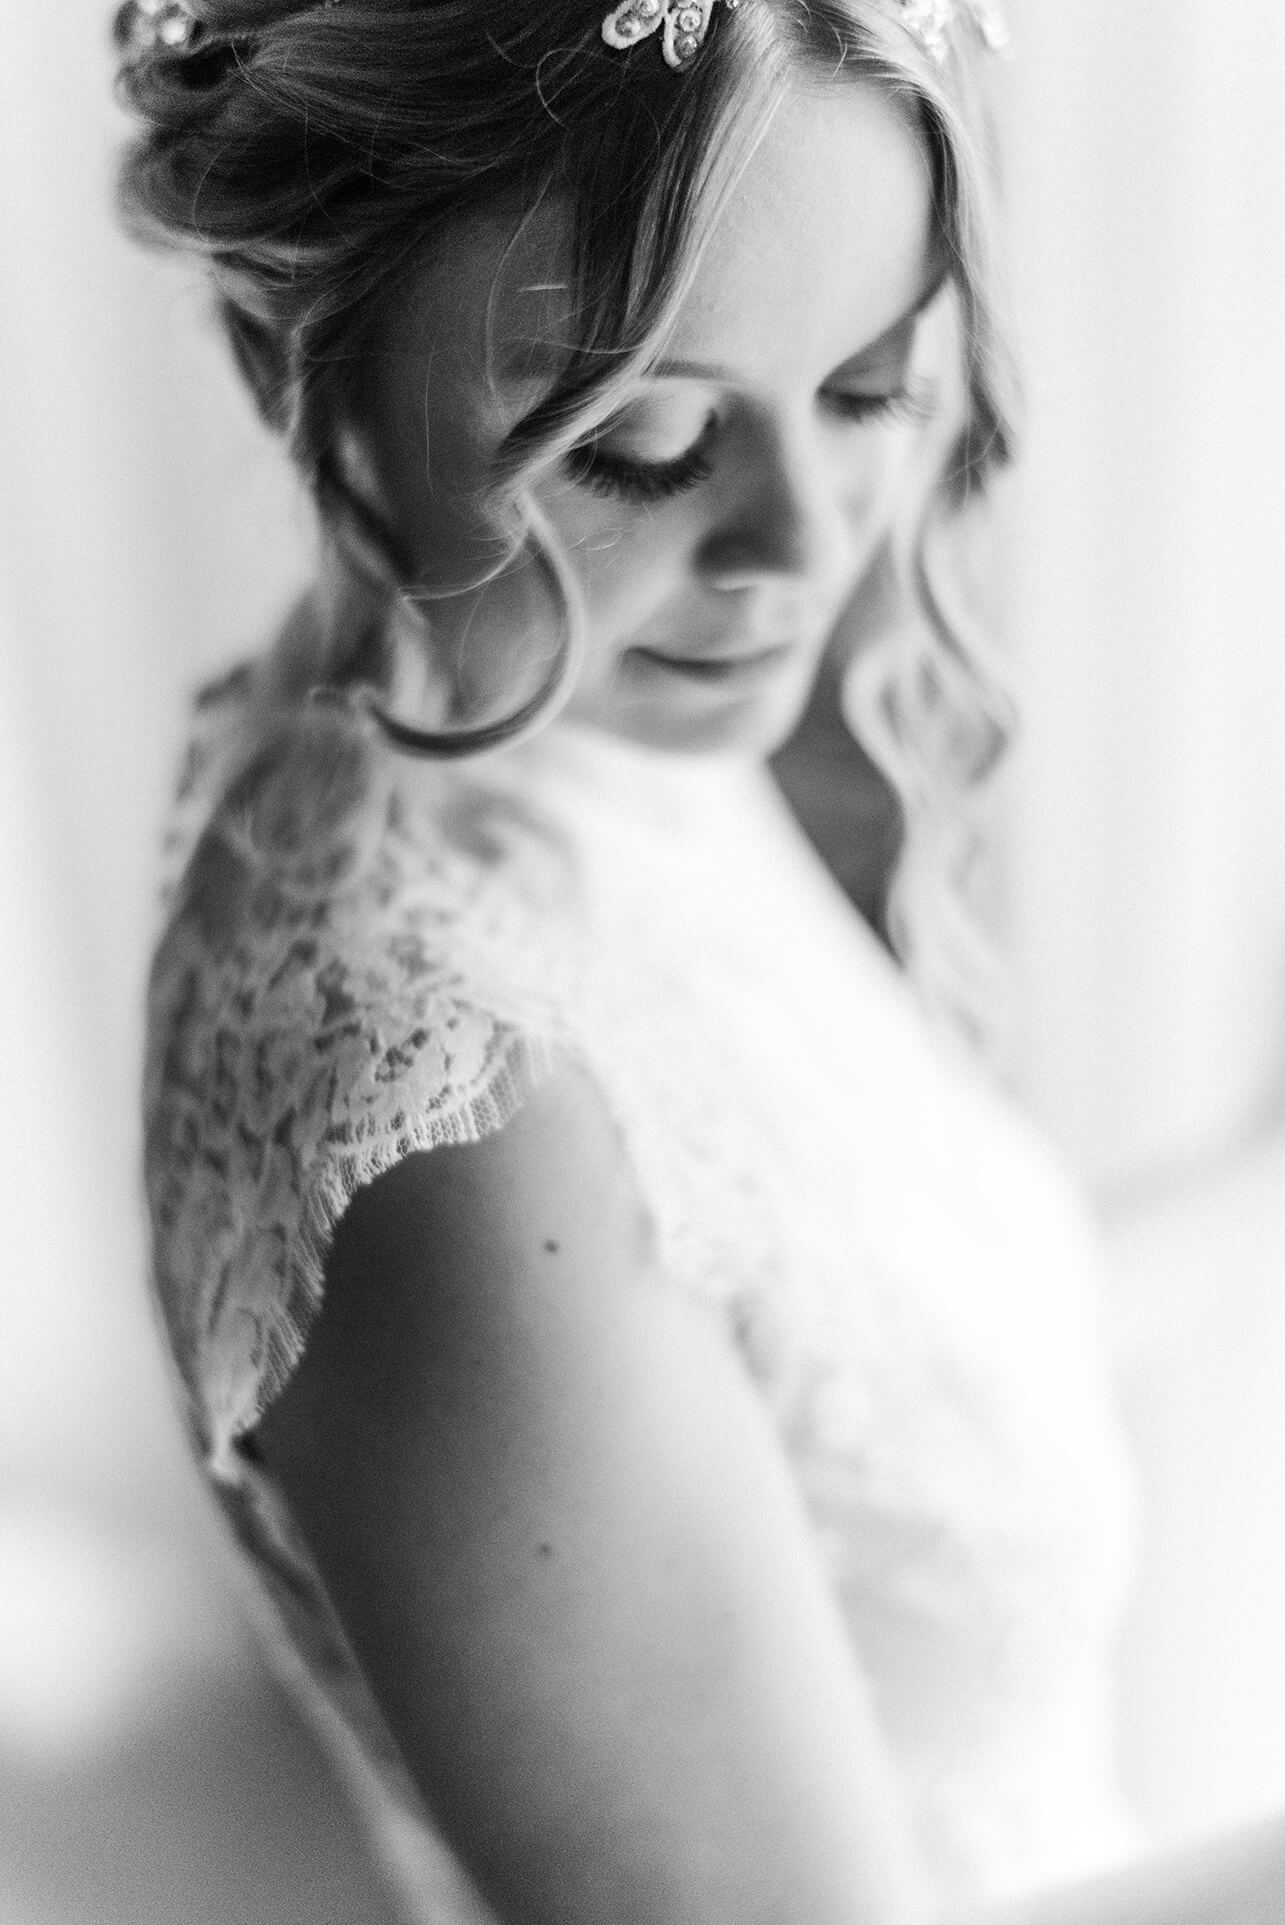 Rebecca Conte Fotografie Ludwigsburg: Braut